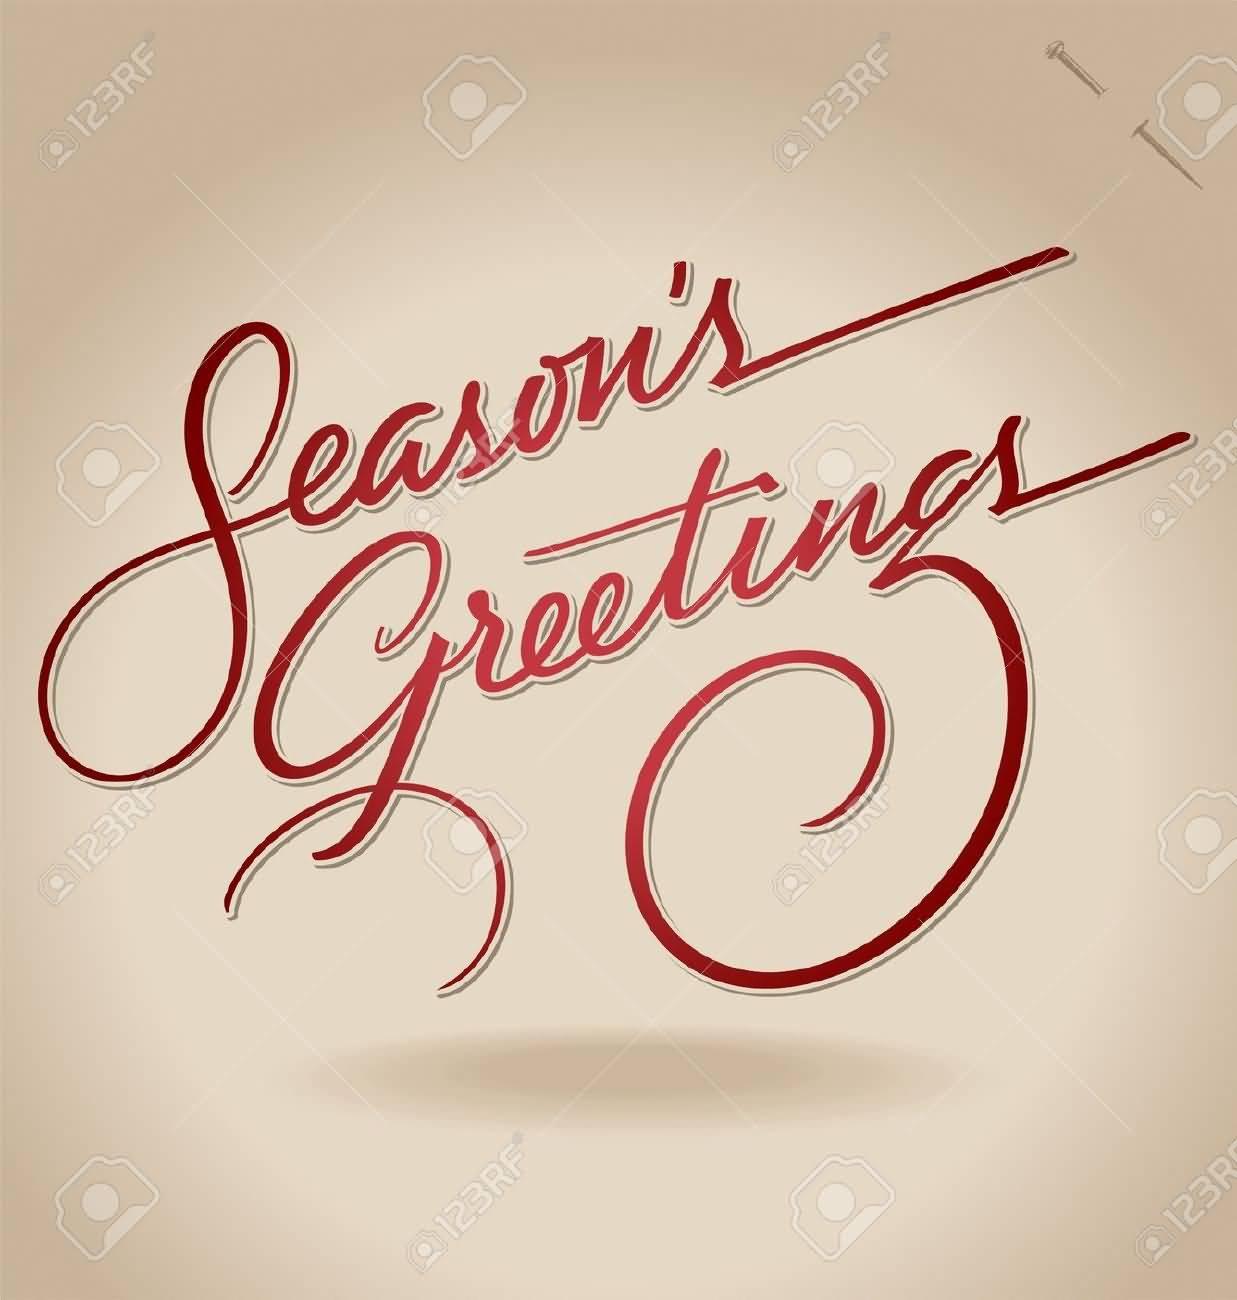 55 Best Seasons Greetings And Photos